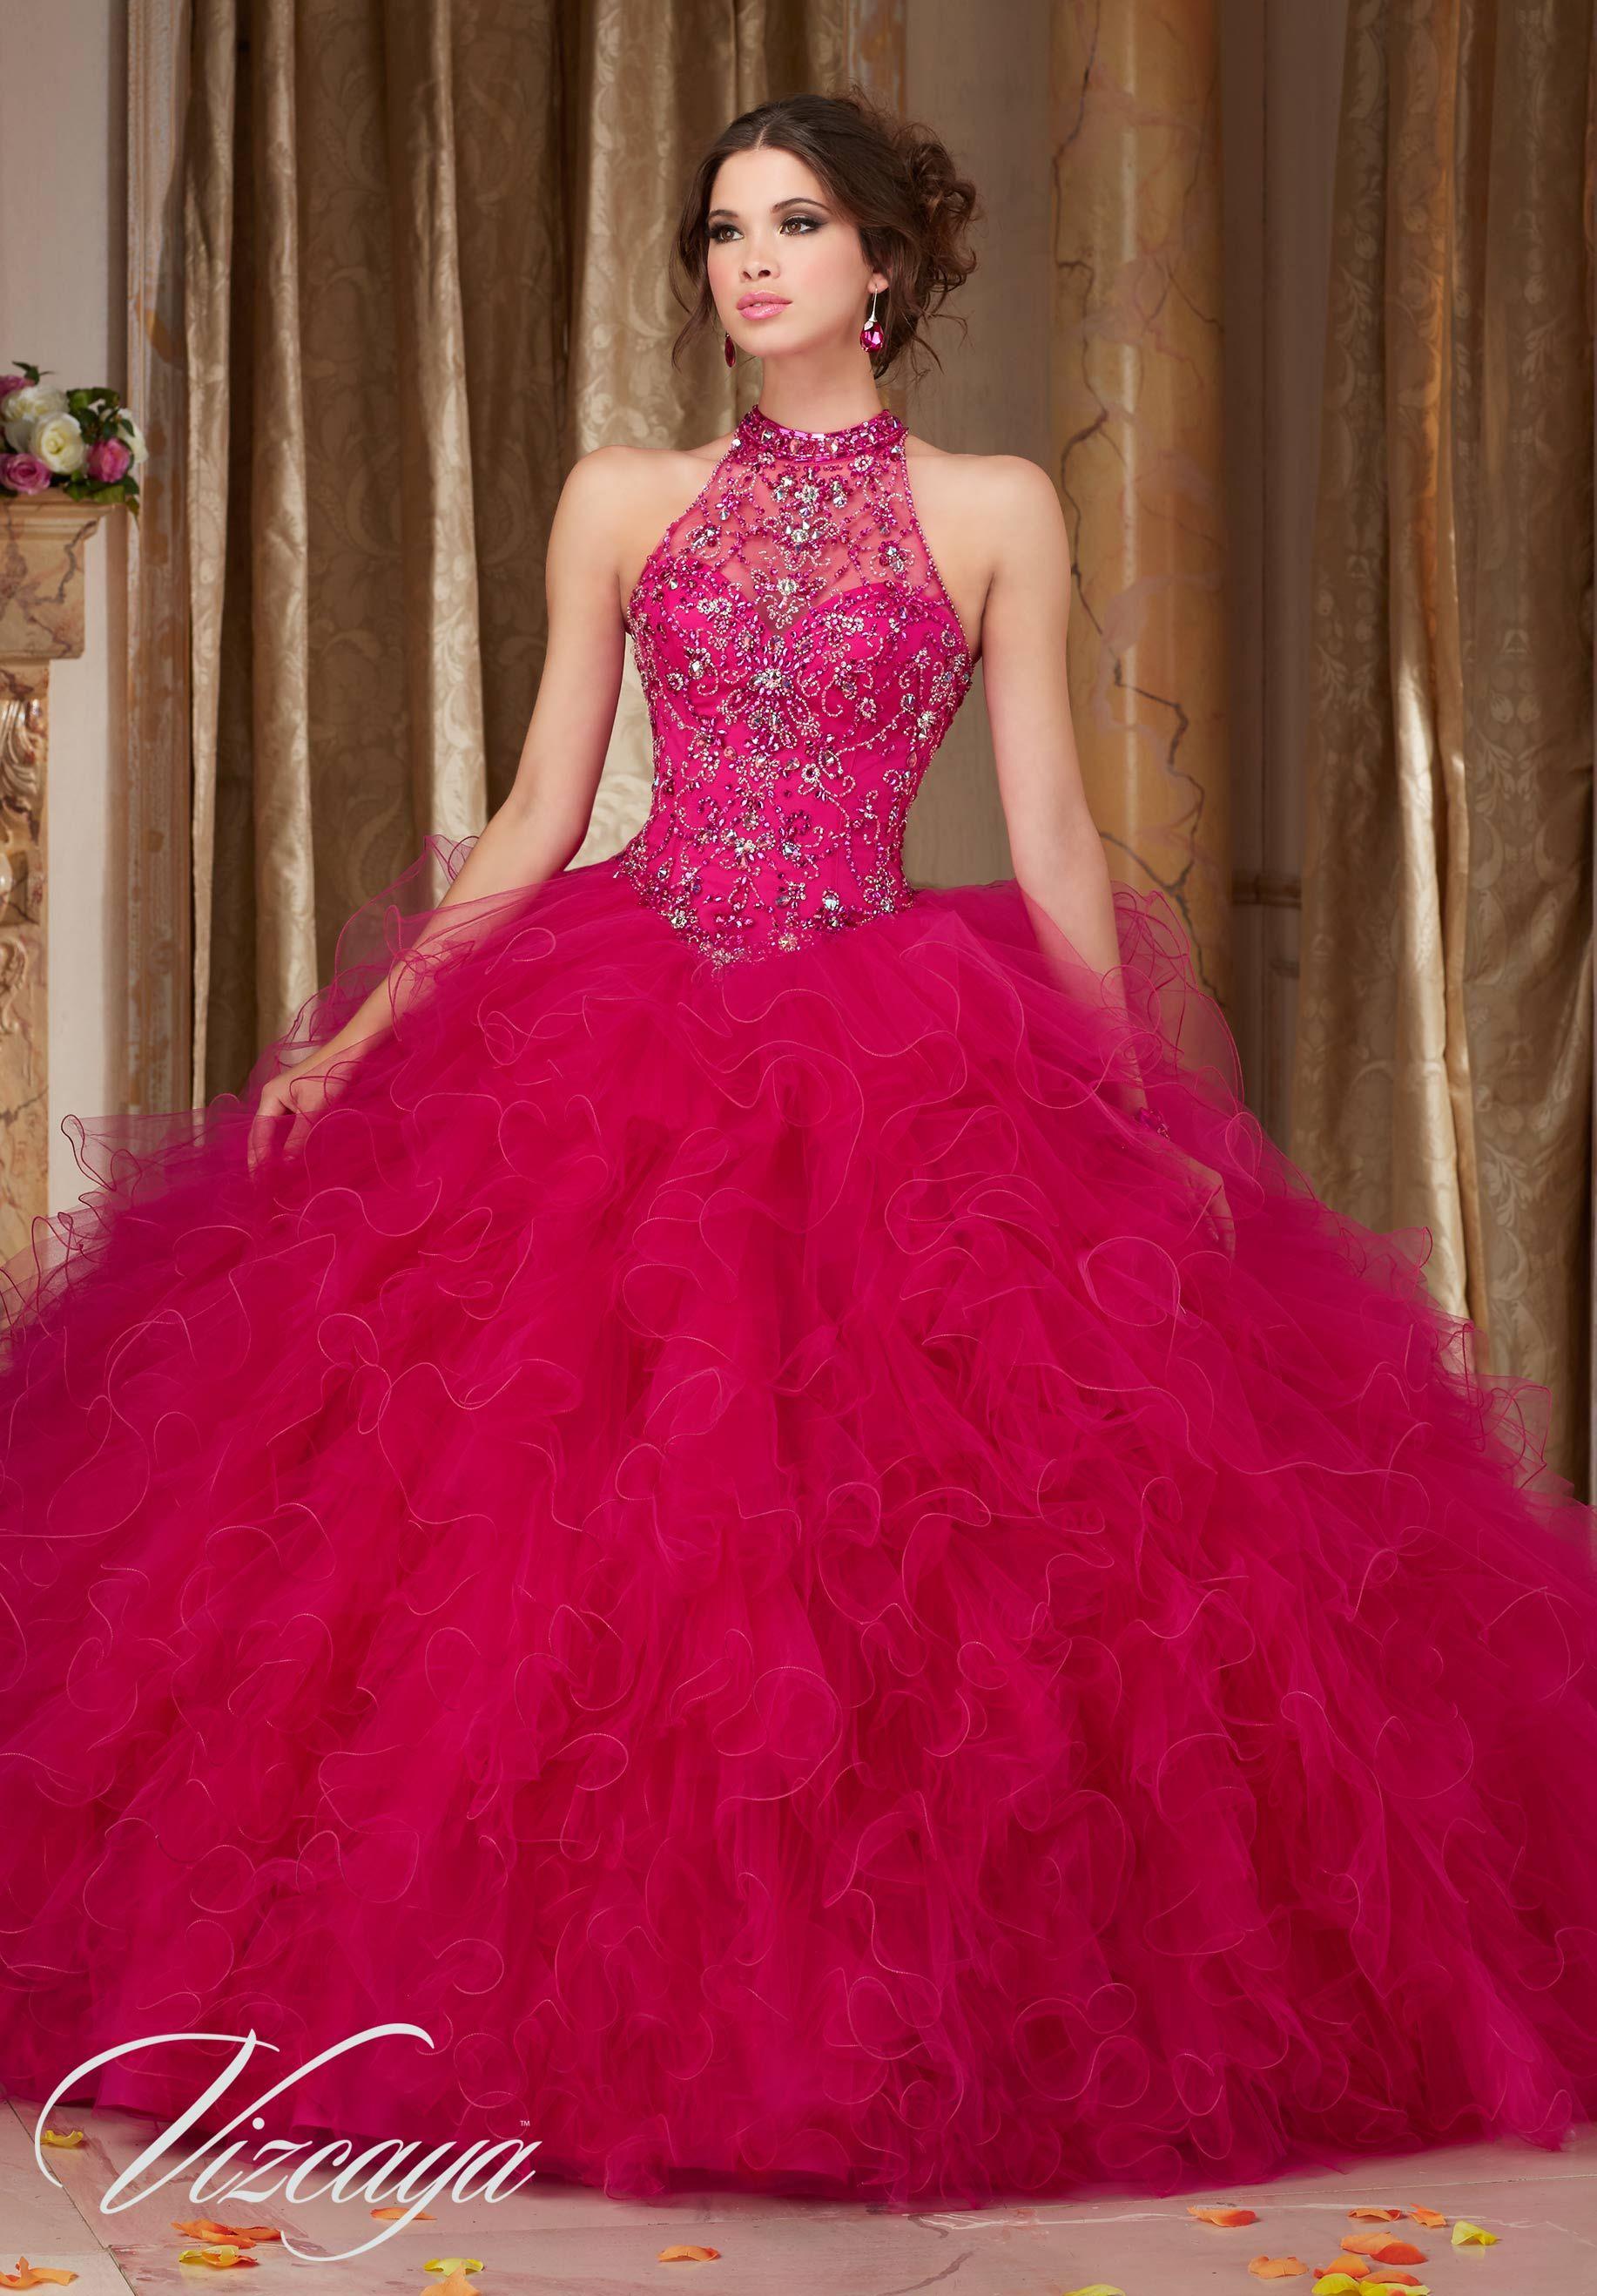 Quinceanera Dresses Pink Sweet 15 Dresses Mori Lee Quinceanera Dresses [ 2636 x 1834 Pixel ]